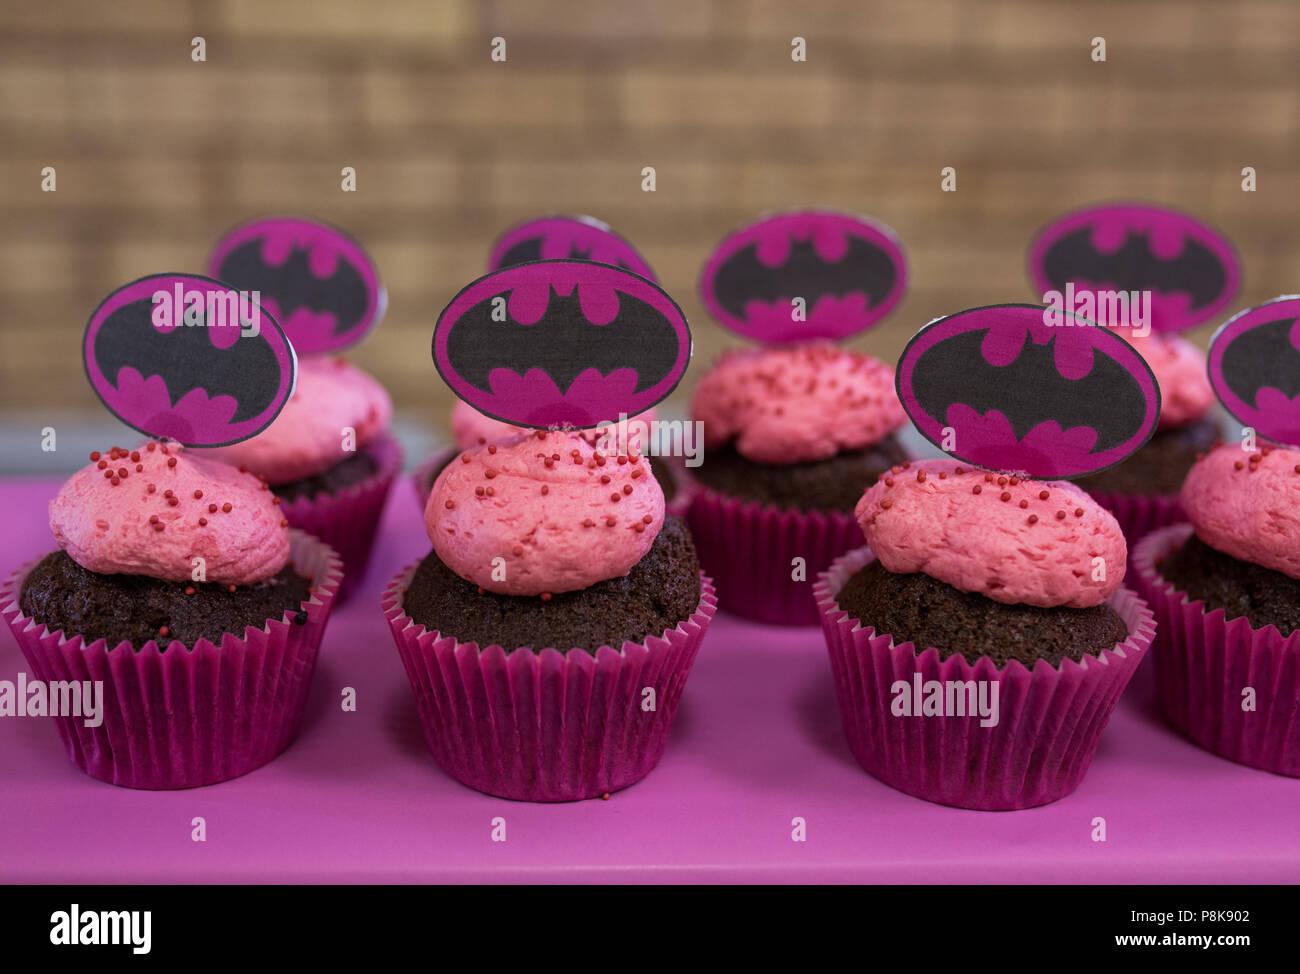 Cupcakery Imágenes De Stock & Cupcakery Fotos De Stock - Alamy